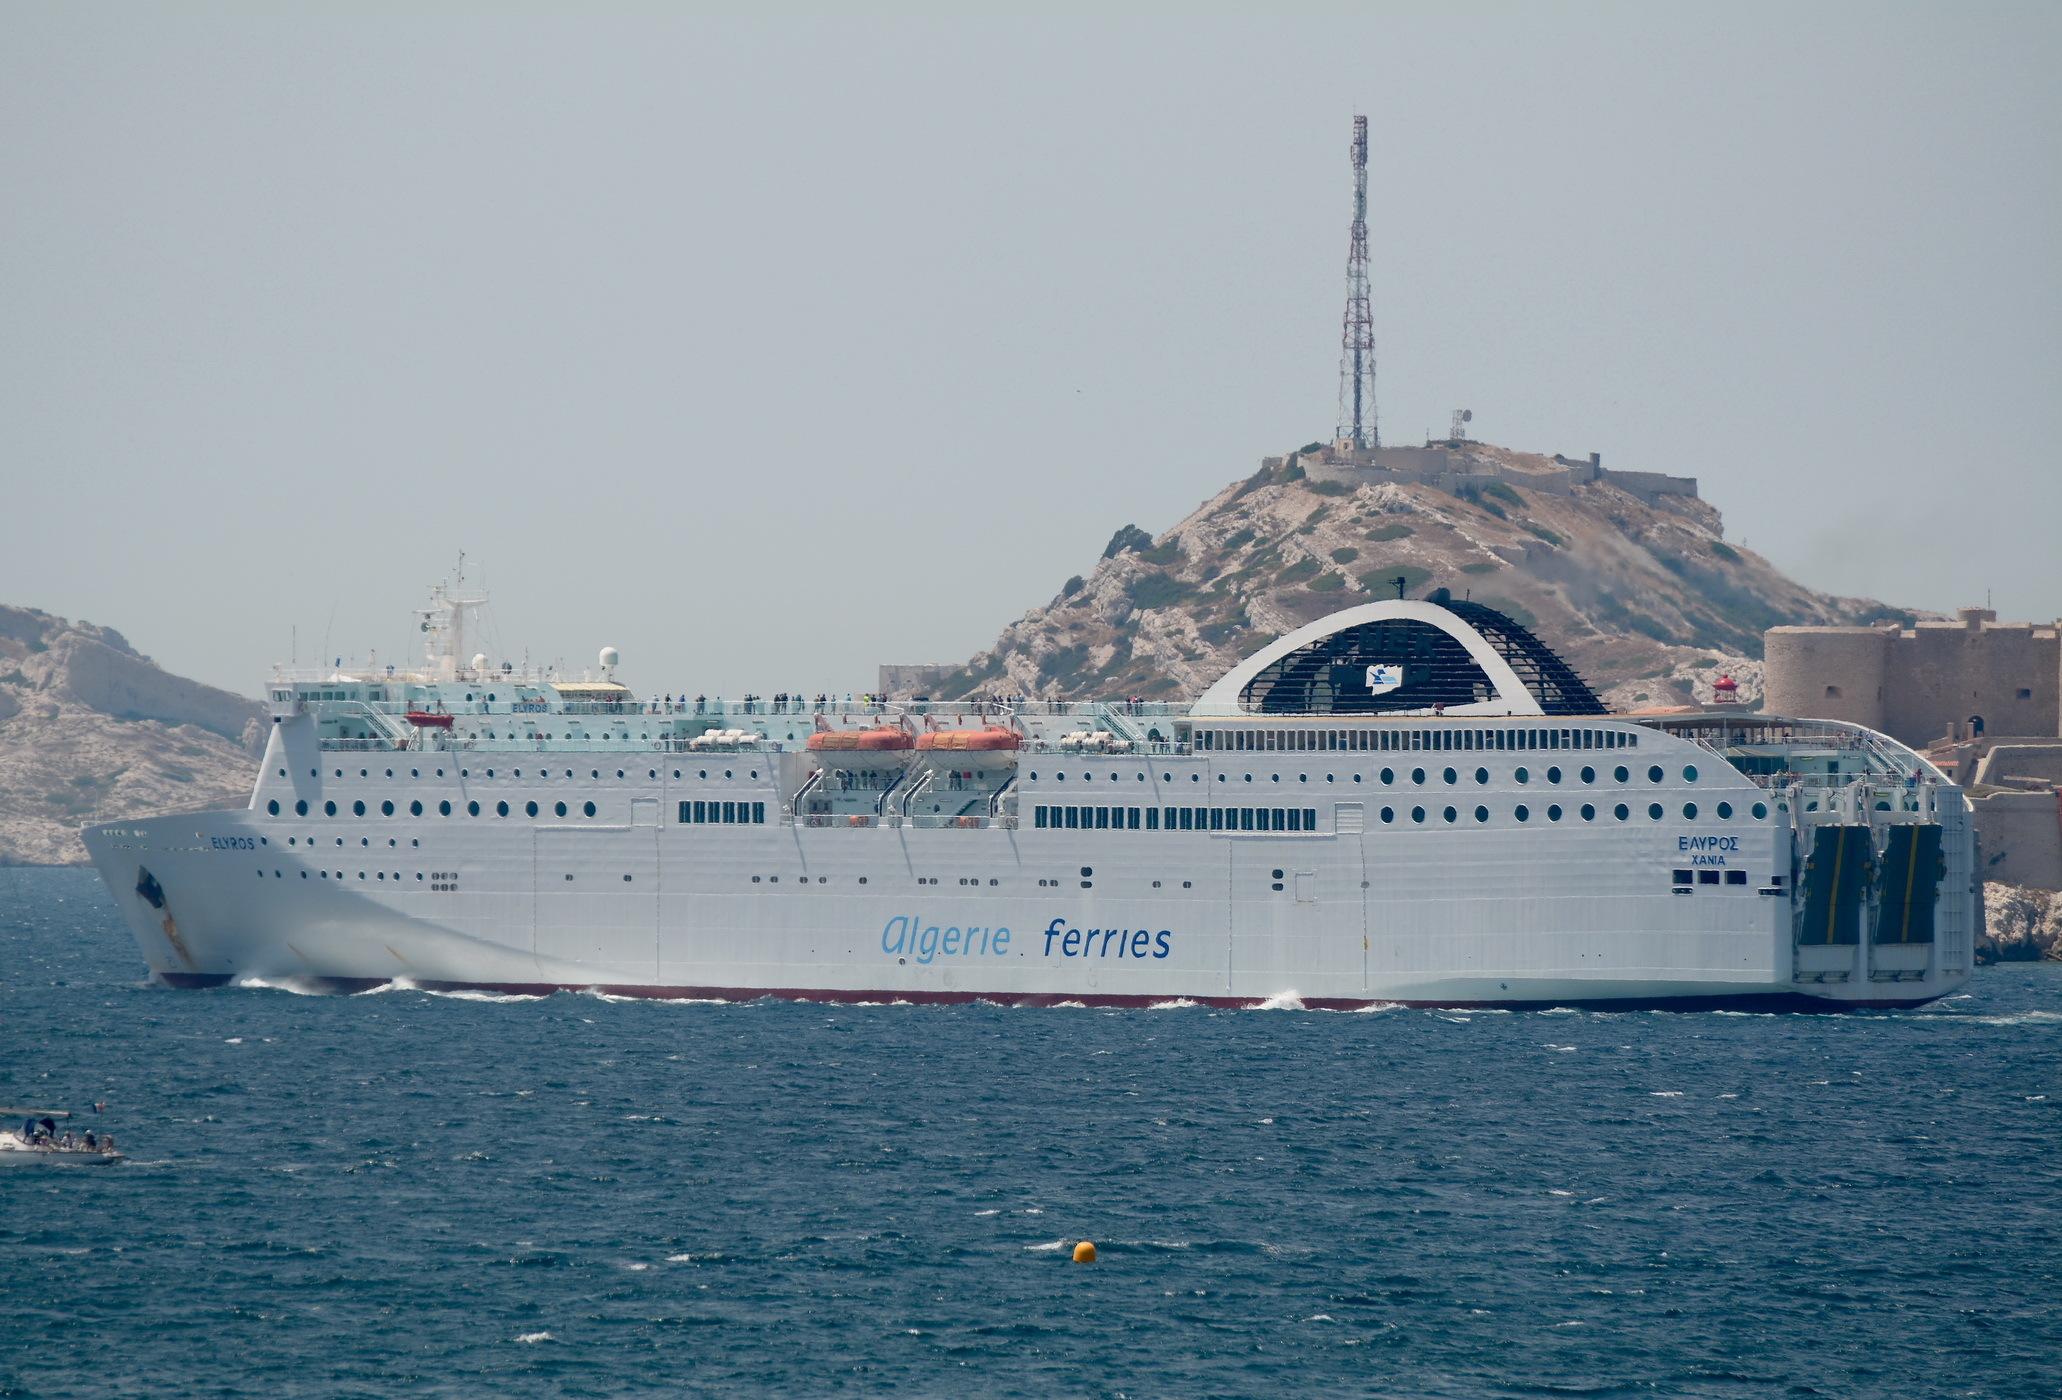 Elyros_08-07-17_Marseille_12.jpg